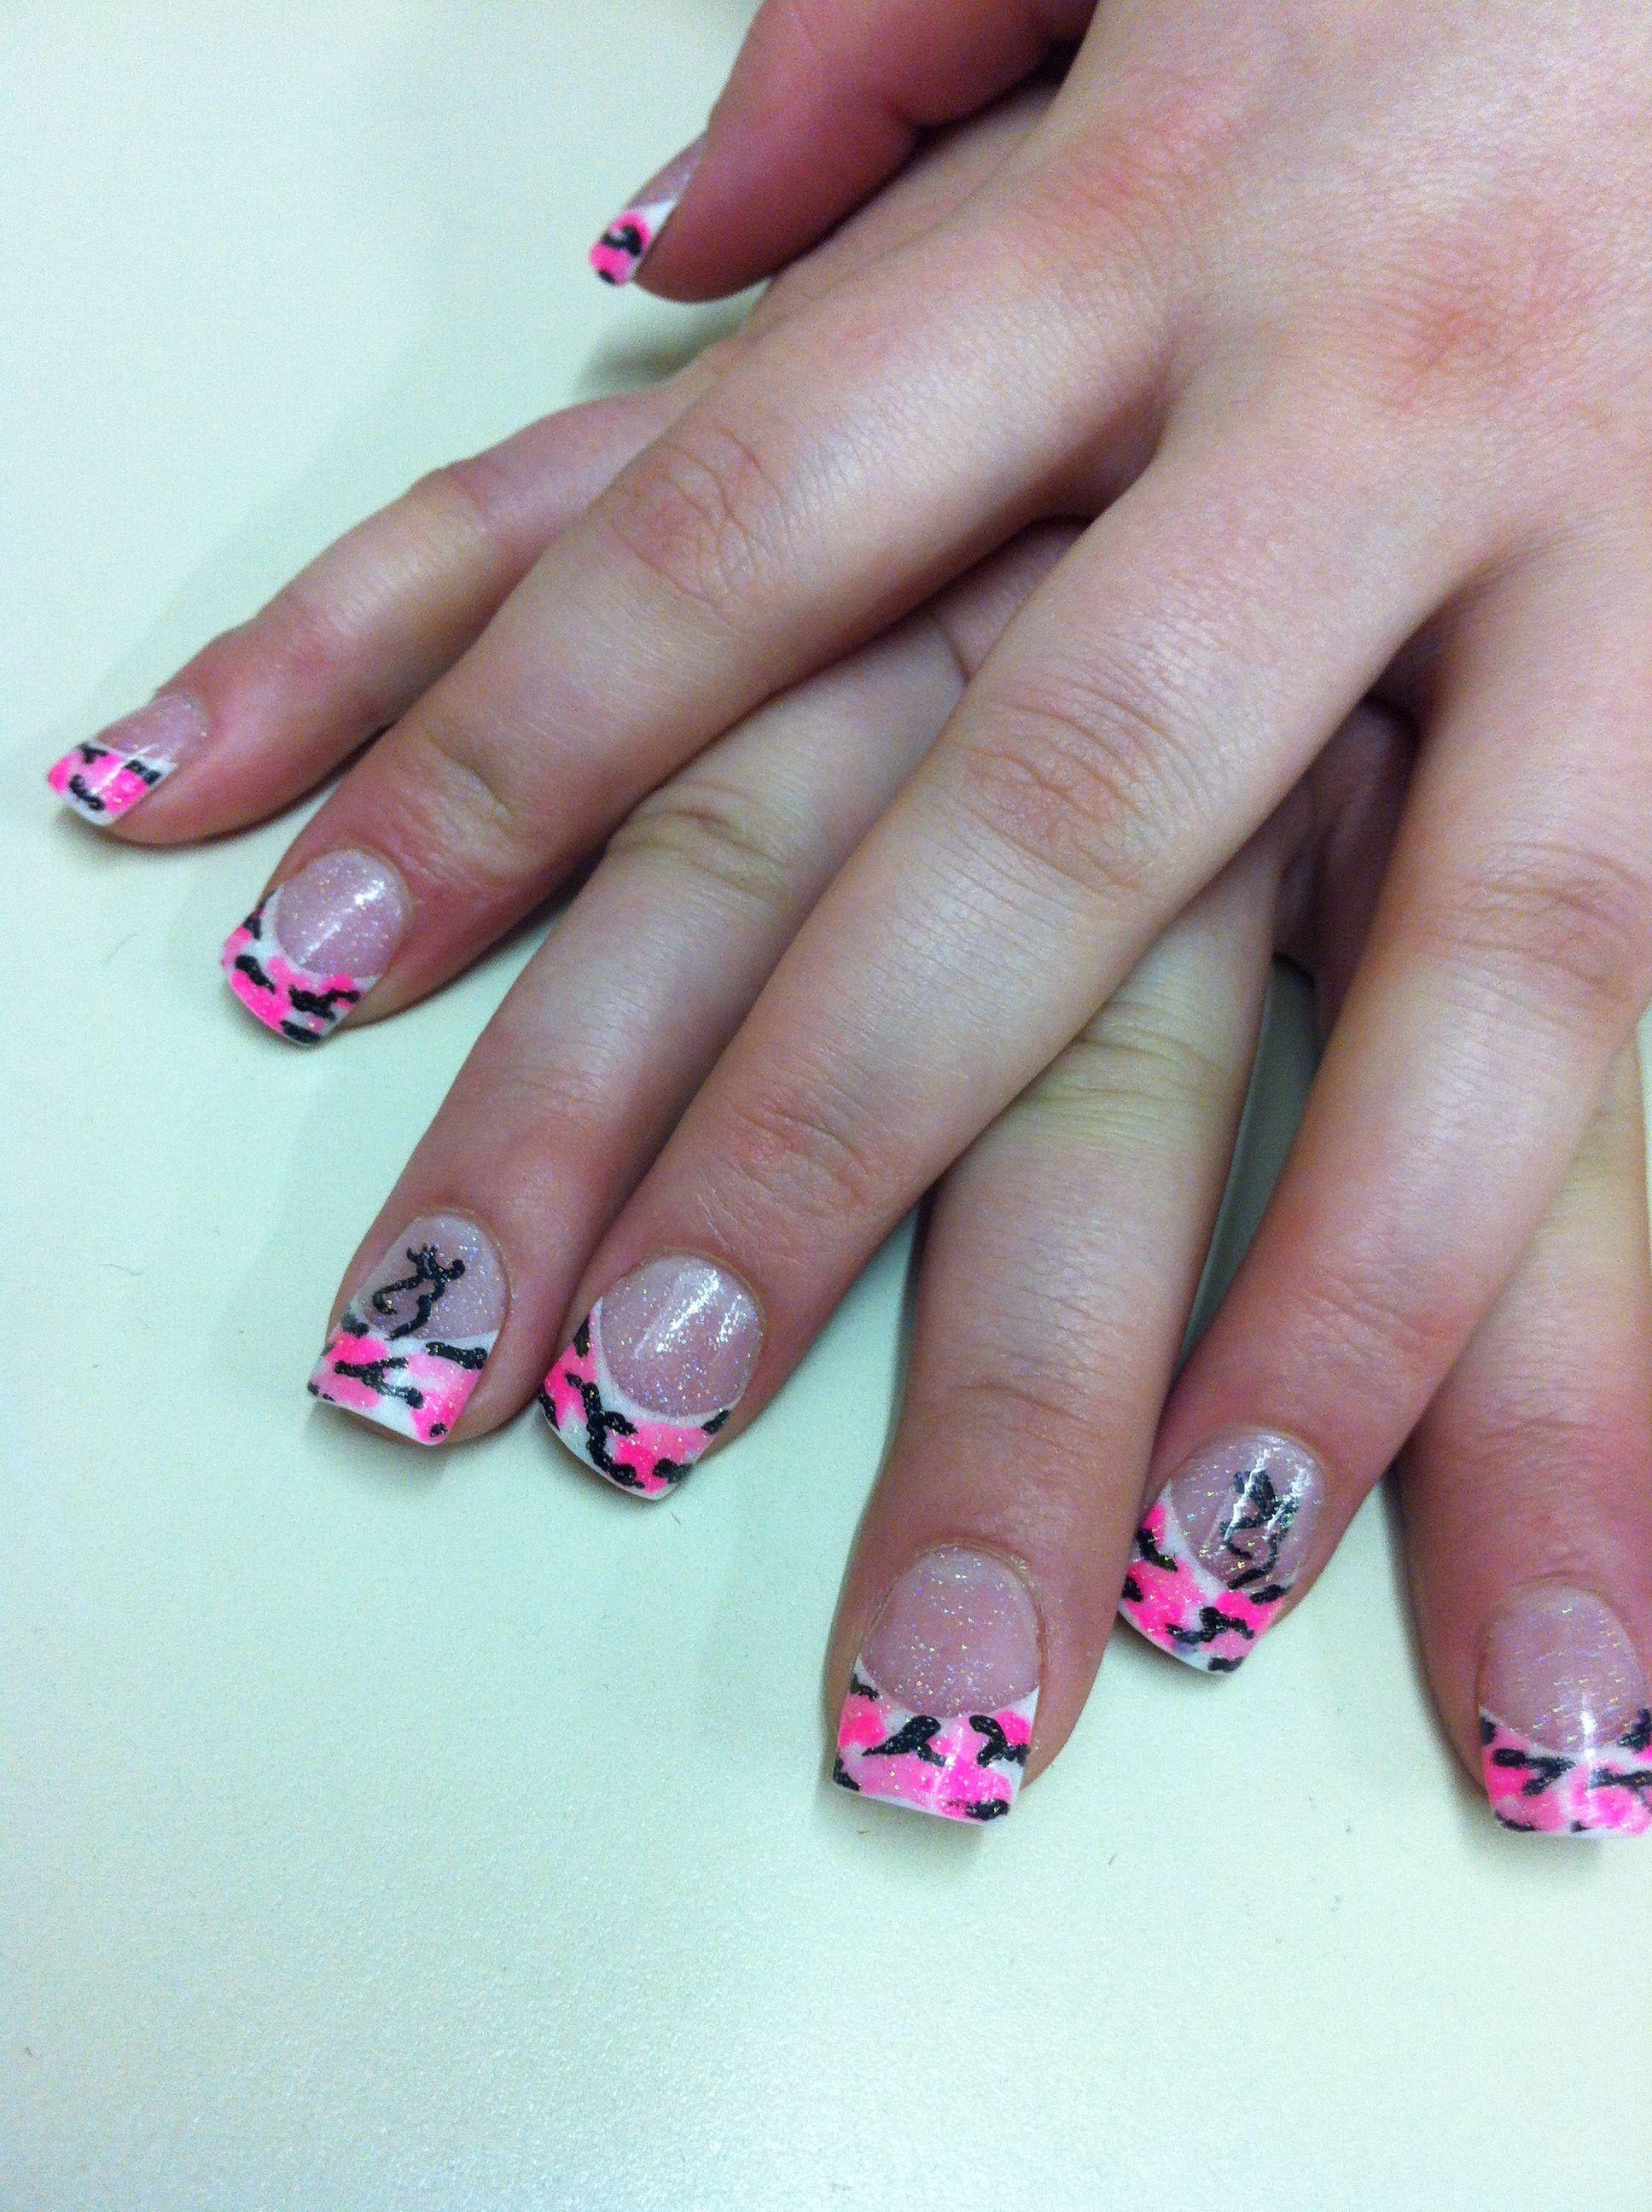 Browning buck and pink camo nails roseburg beauty school browning buck and pink camo nails roseburg beauty school prinsesfo Choice Image